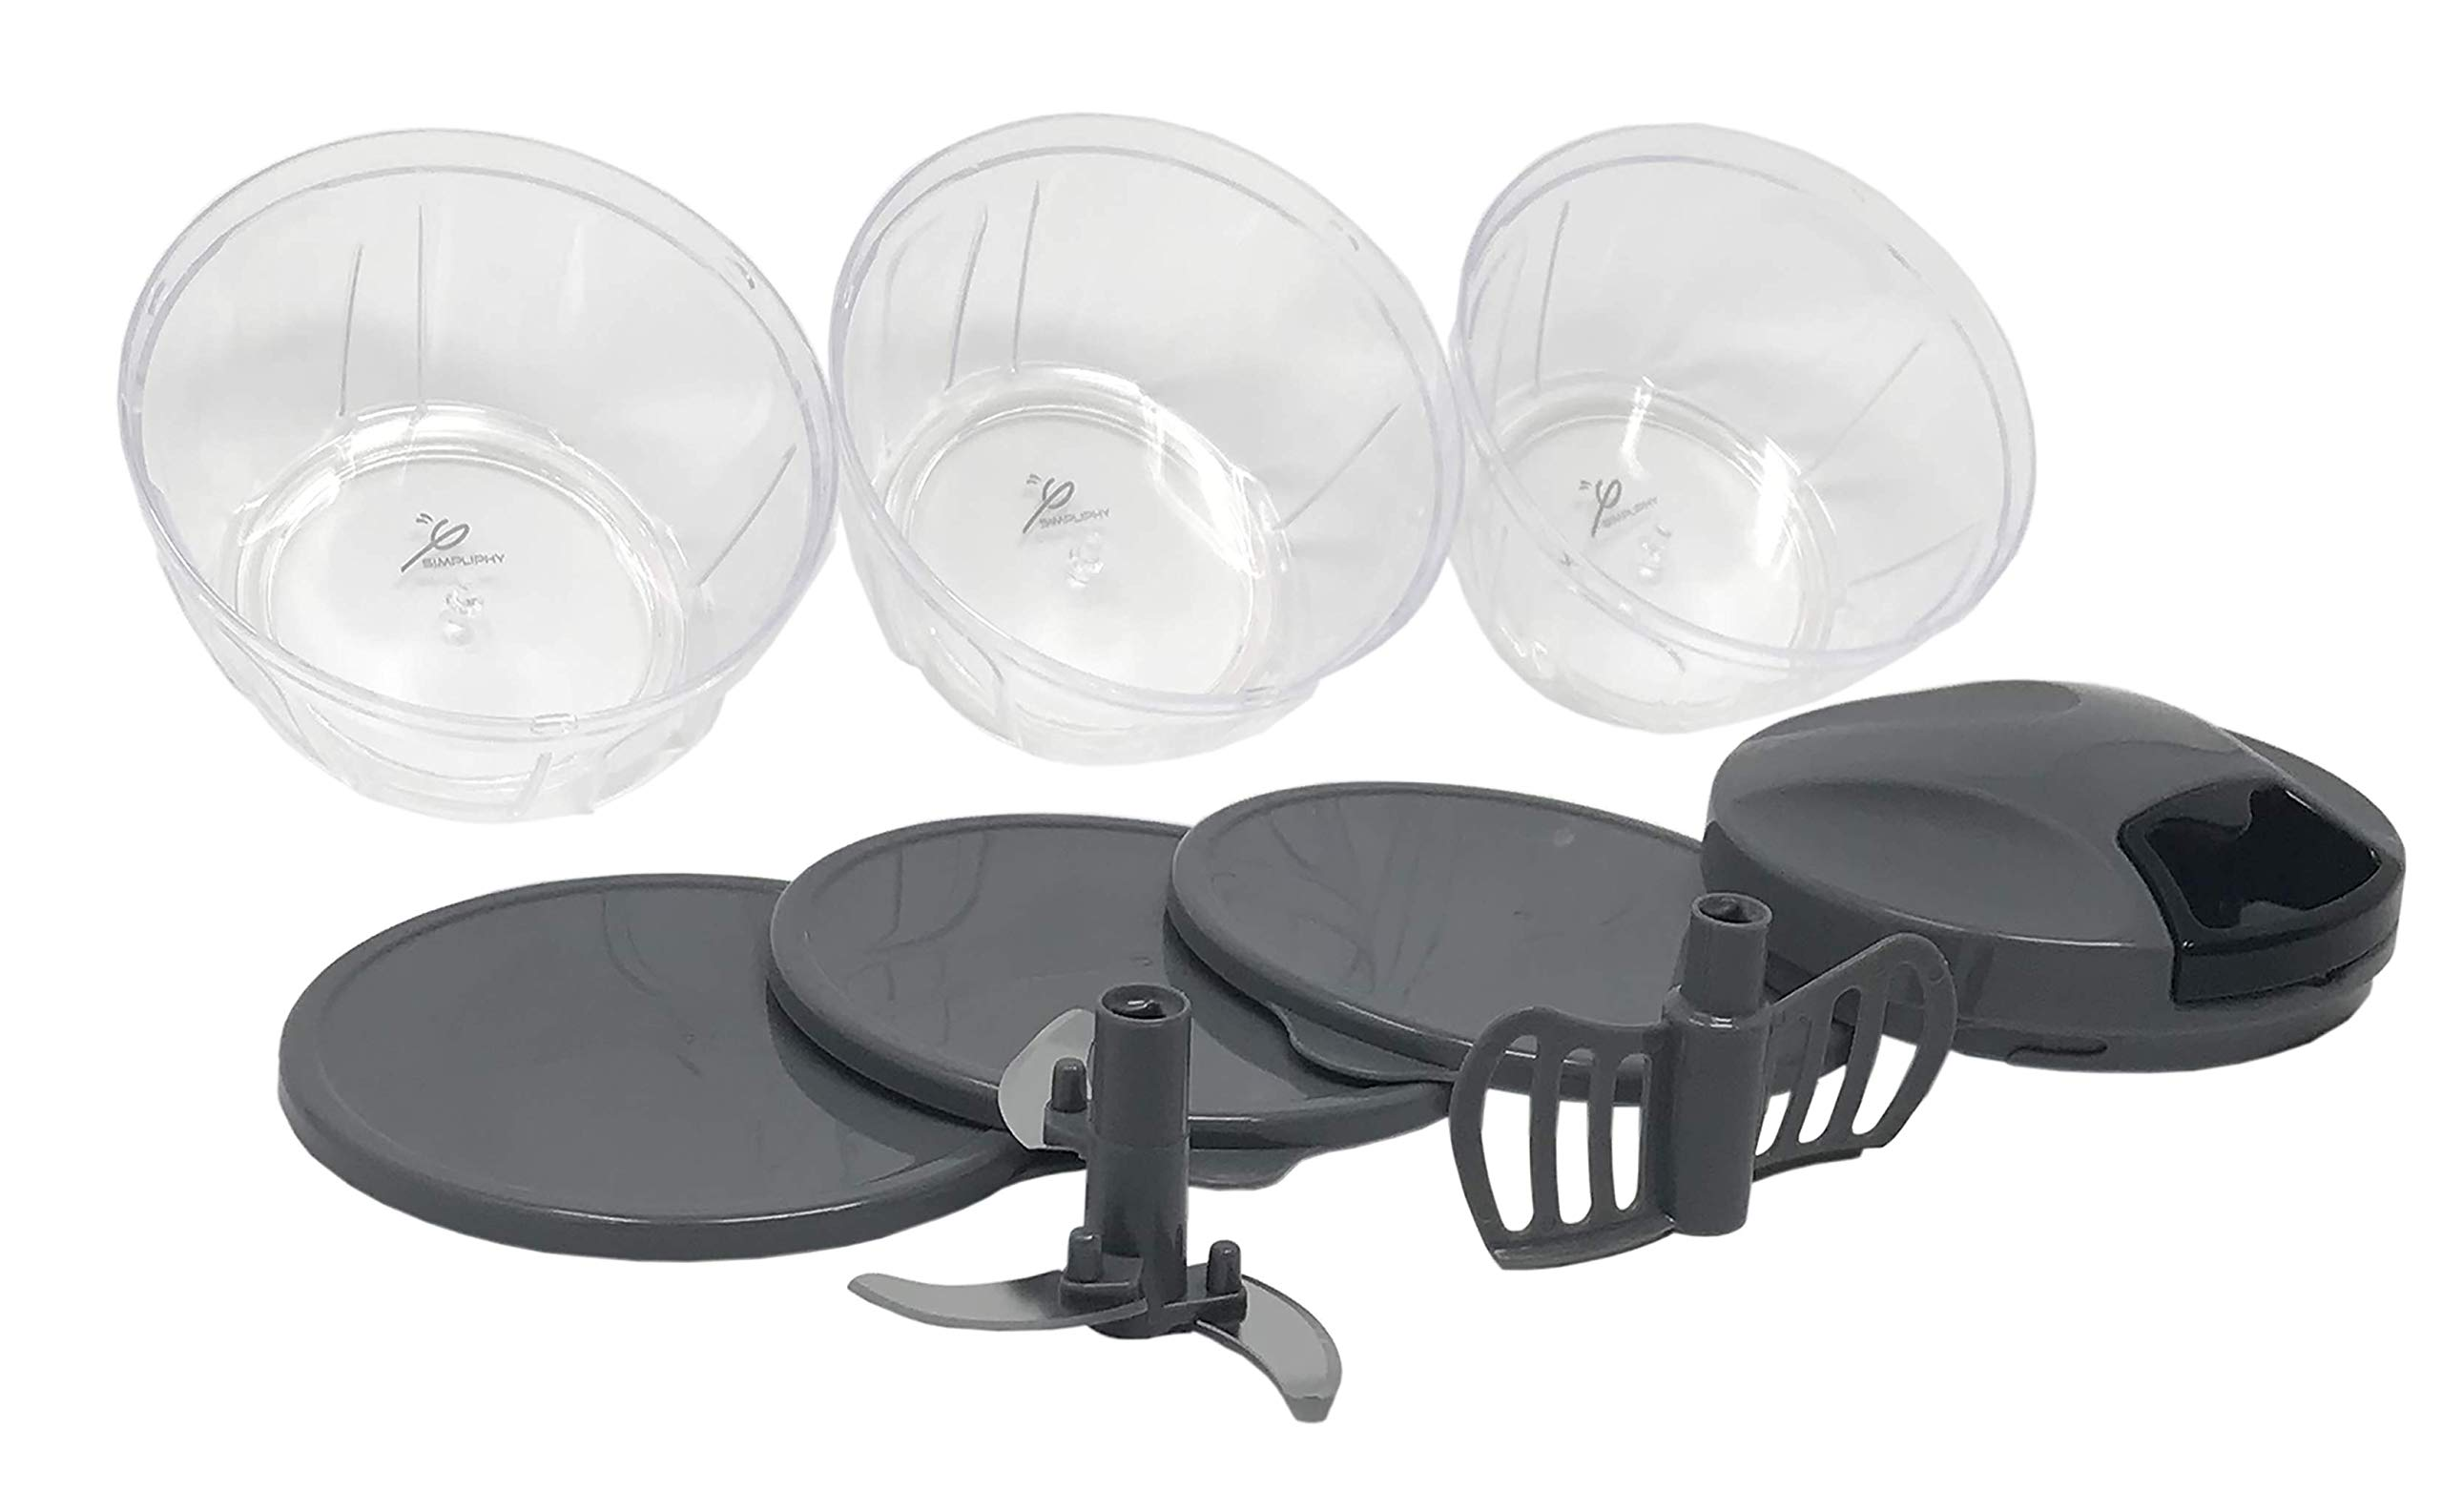 Tribowl Apache, Pull Cord Chopper Speedy Crank Chop with bowls, lids + blender attachment